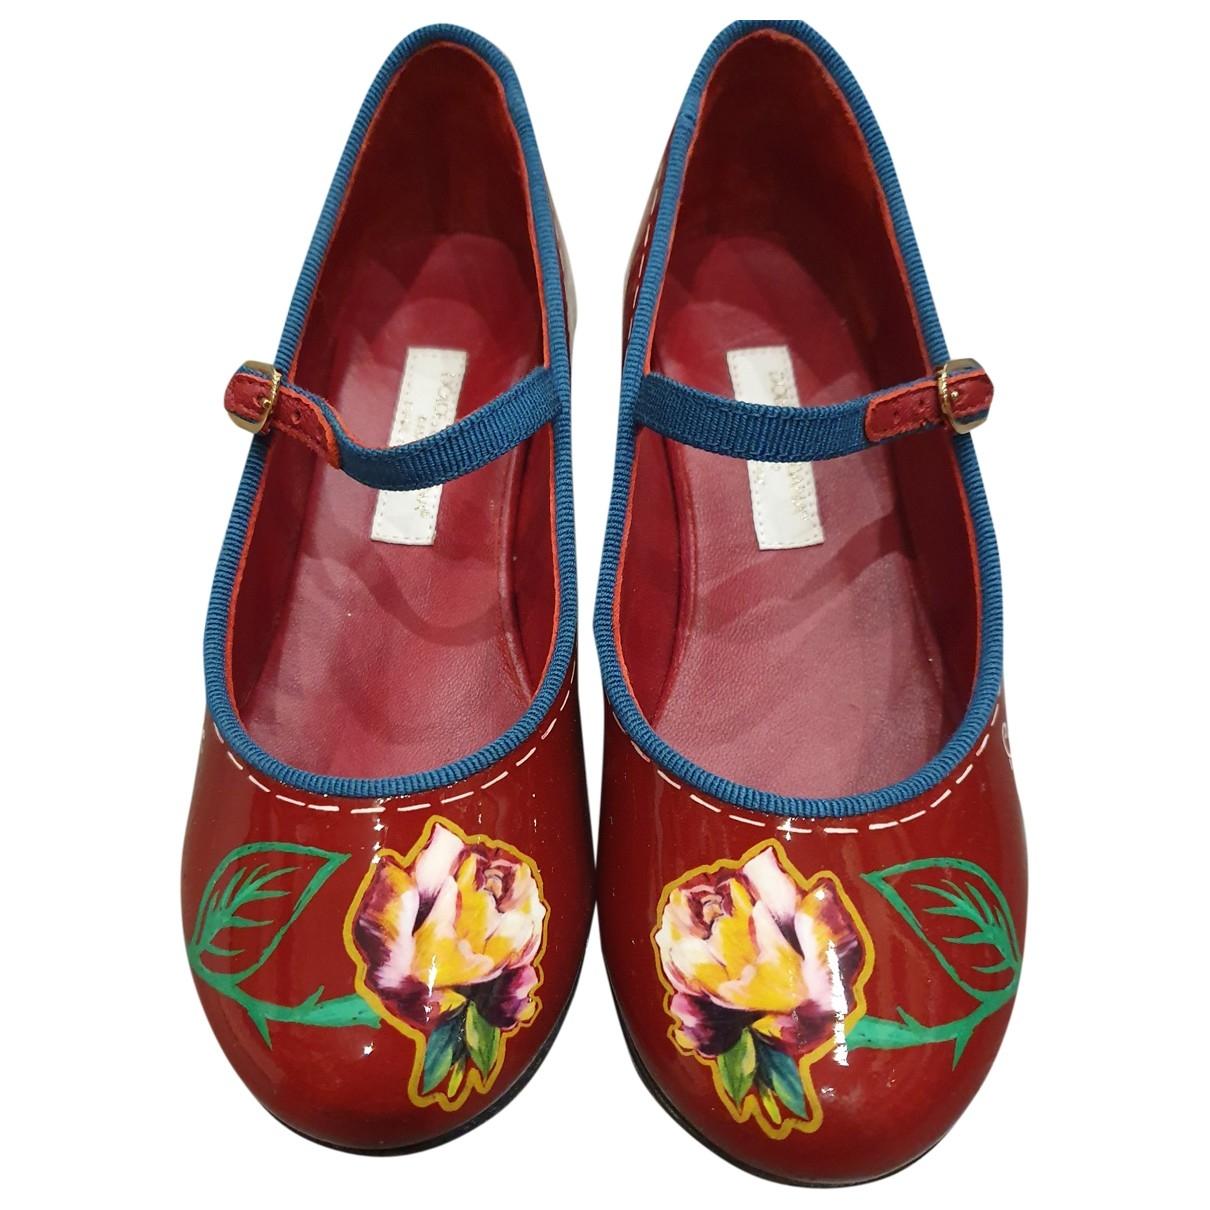 Dolce & Gabbana \N Burgundy Patent leather Ballet flats for Kids 29 EU